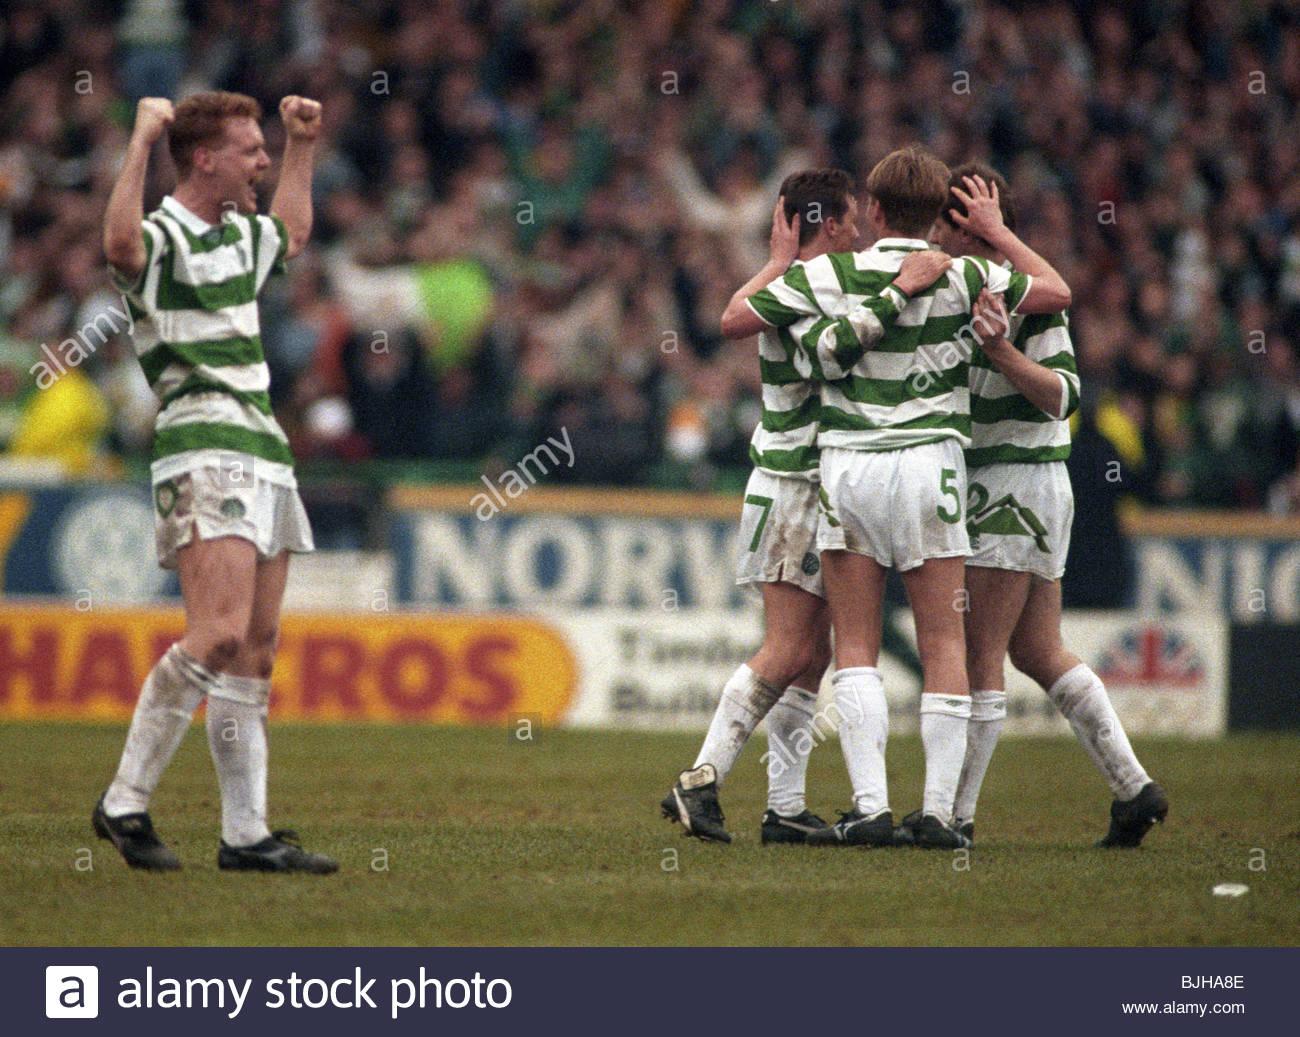 20/03/93 PREMIER DIVISION CELTIC V RANGERS (2-1) CELTIC PARK - GLASGOW The Celtic players celebrate a 2-1 victory - Stock Image